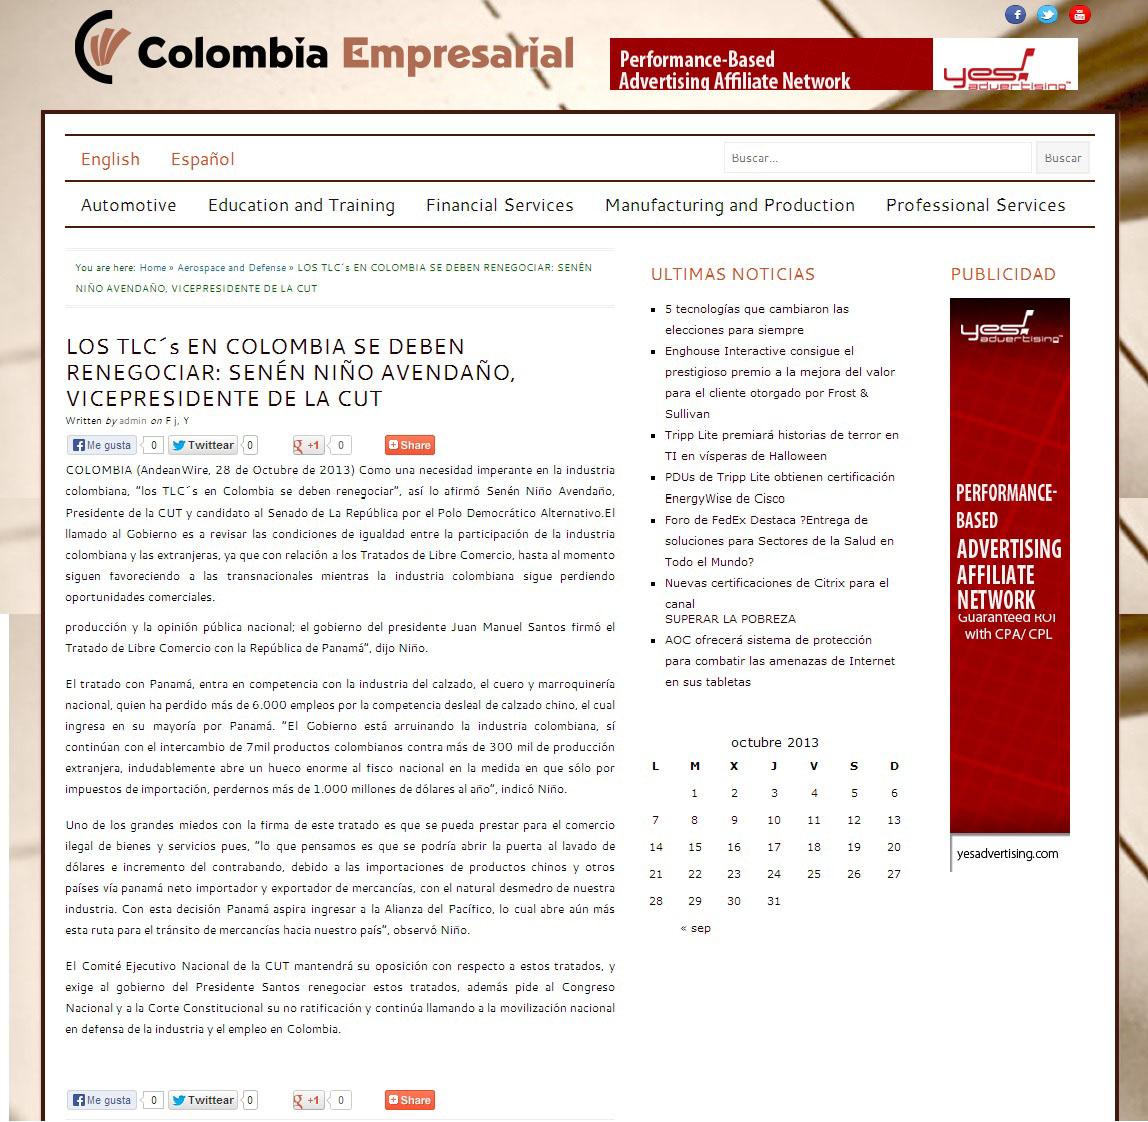 colombiaempreserial.com.co TLC 28 de oct. 2013